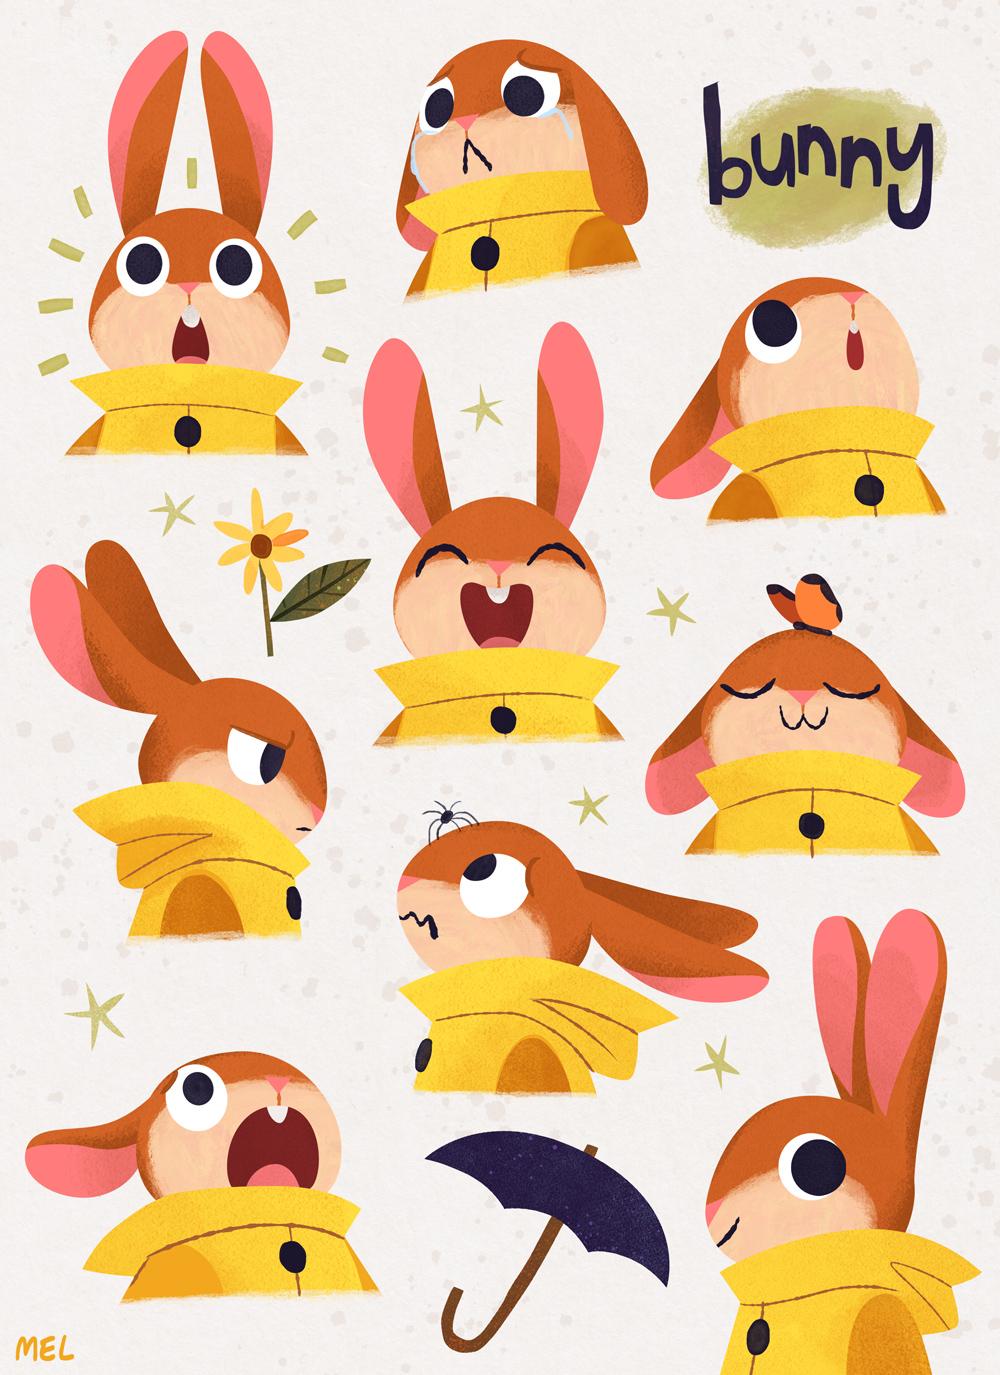 Character_bun_expressions_2.jpg